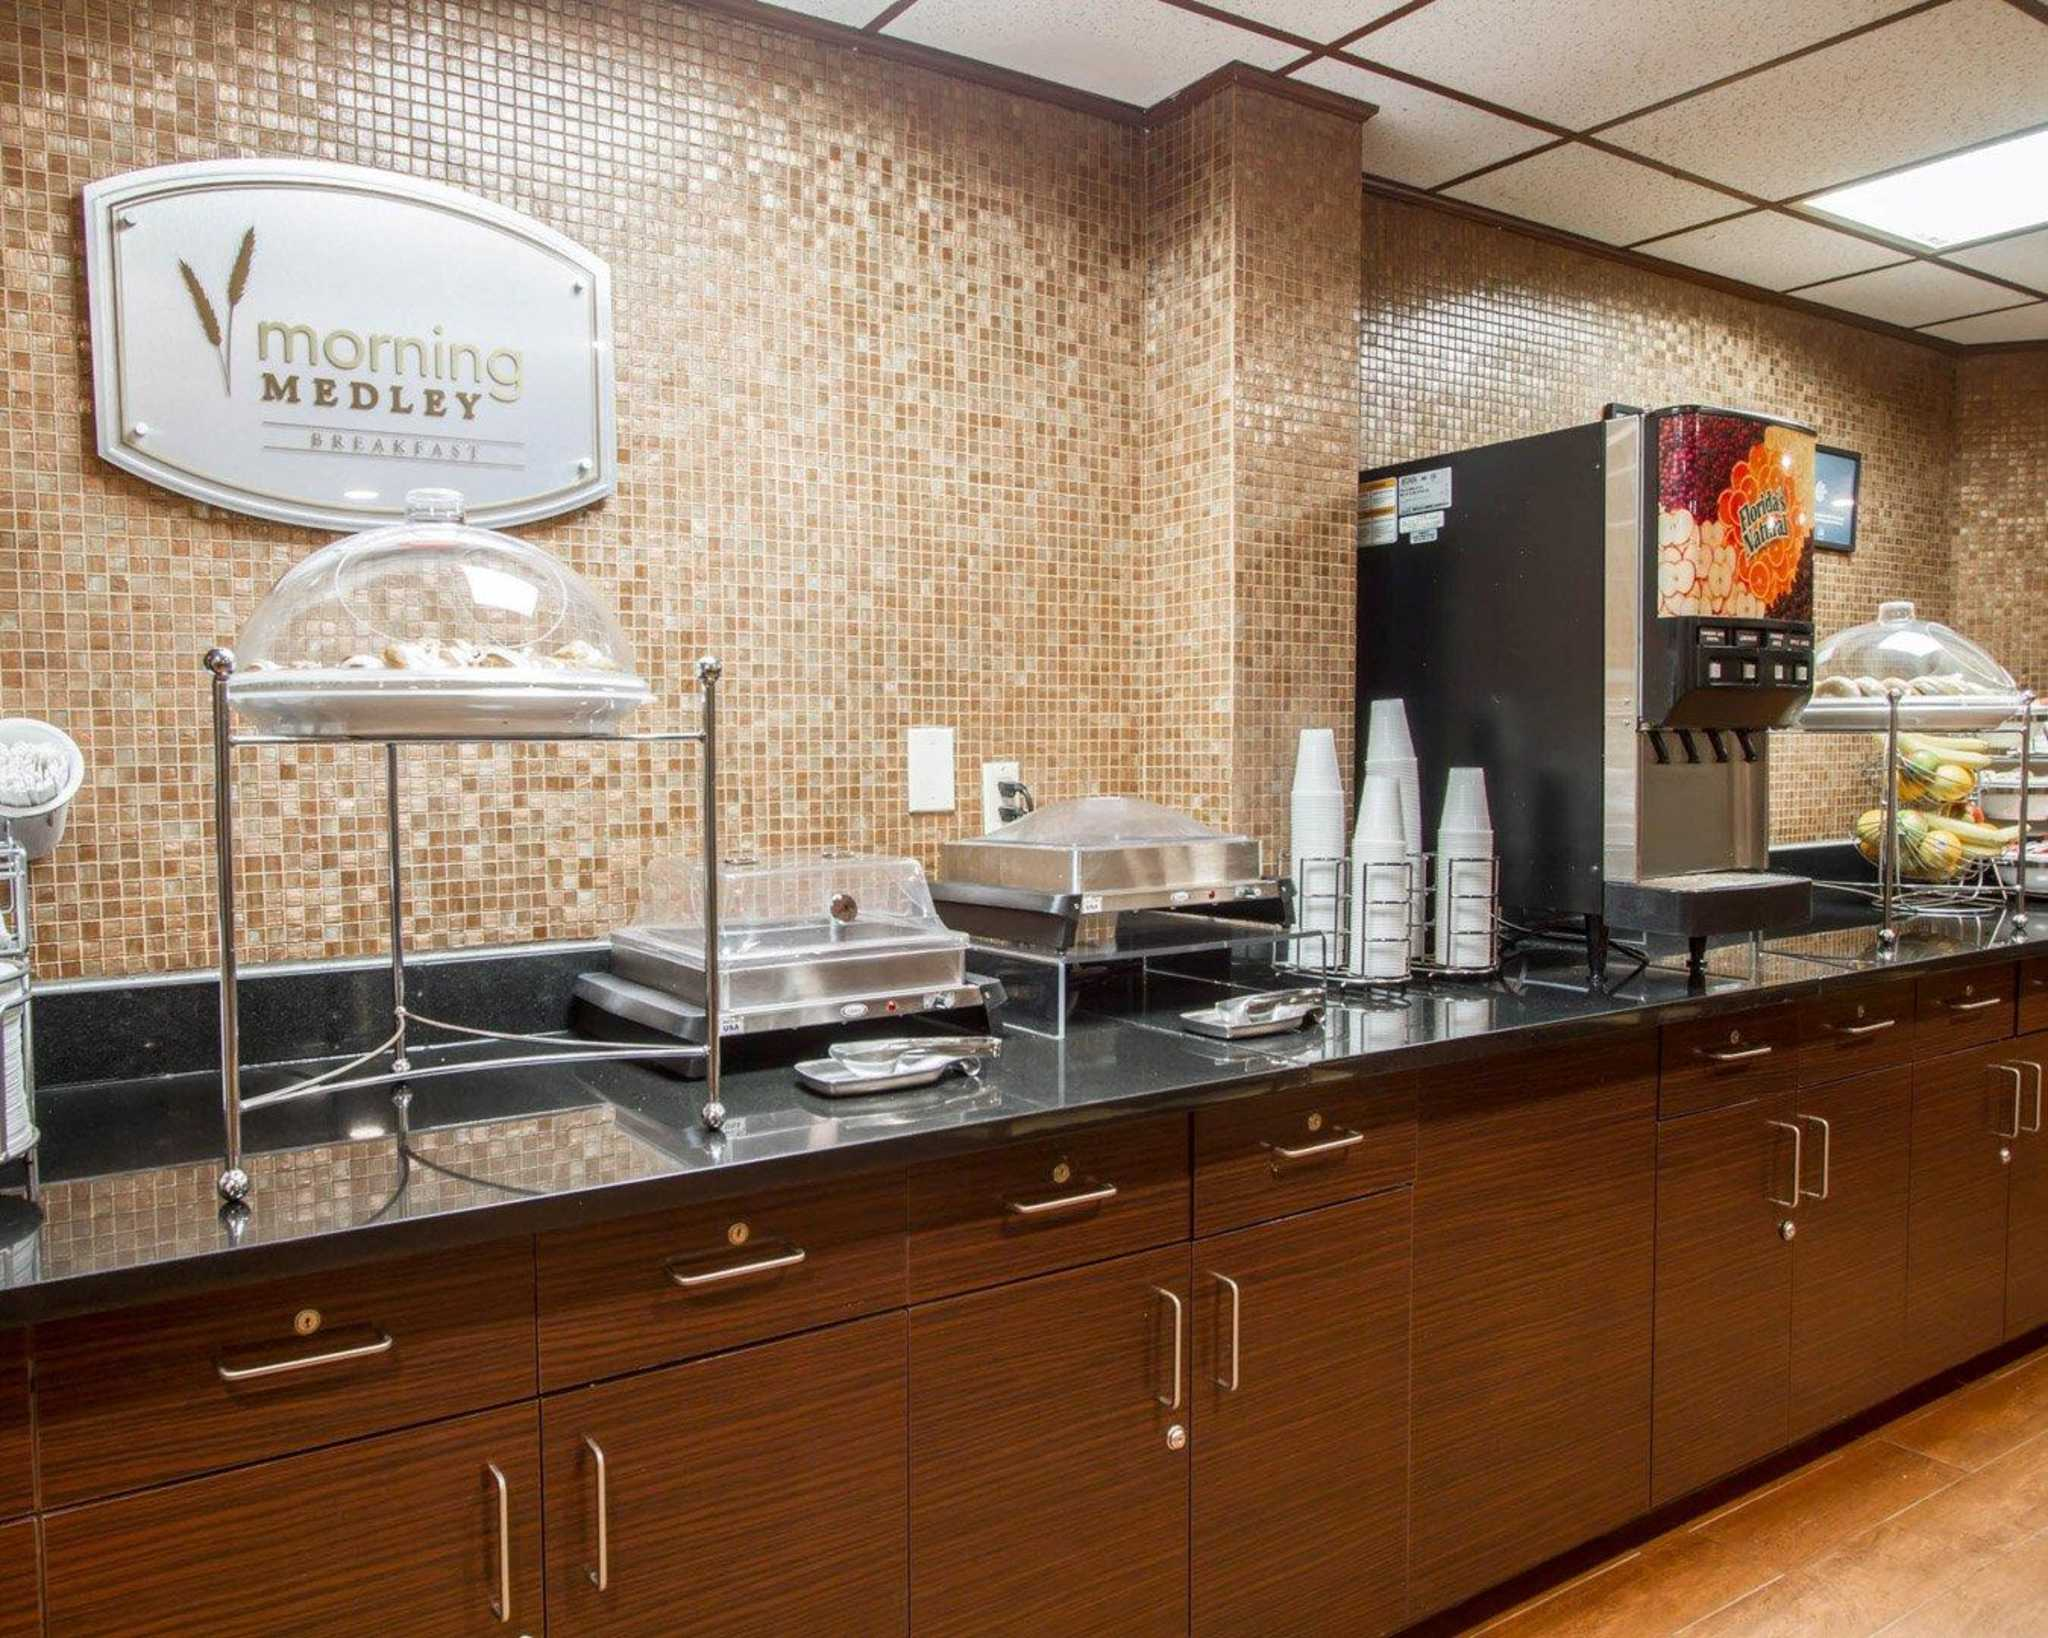 Sleep Inn & Suites Buffalo Airport image 19